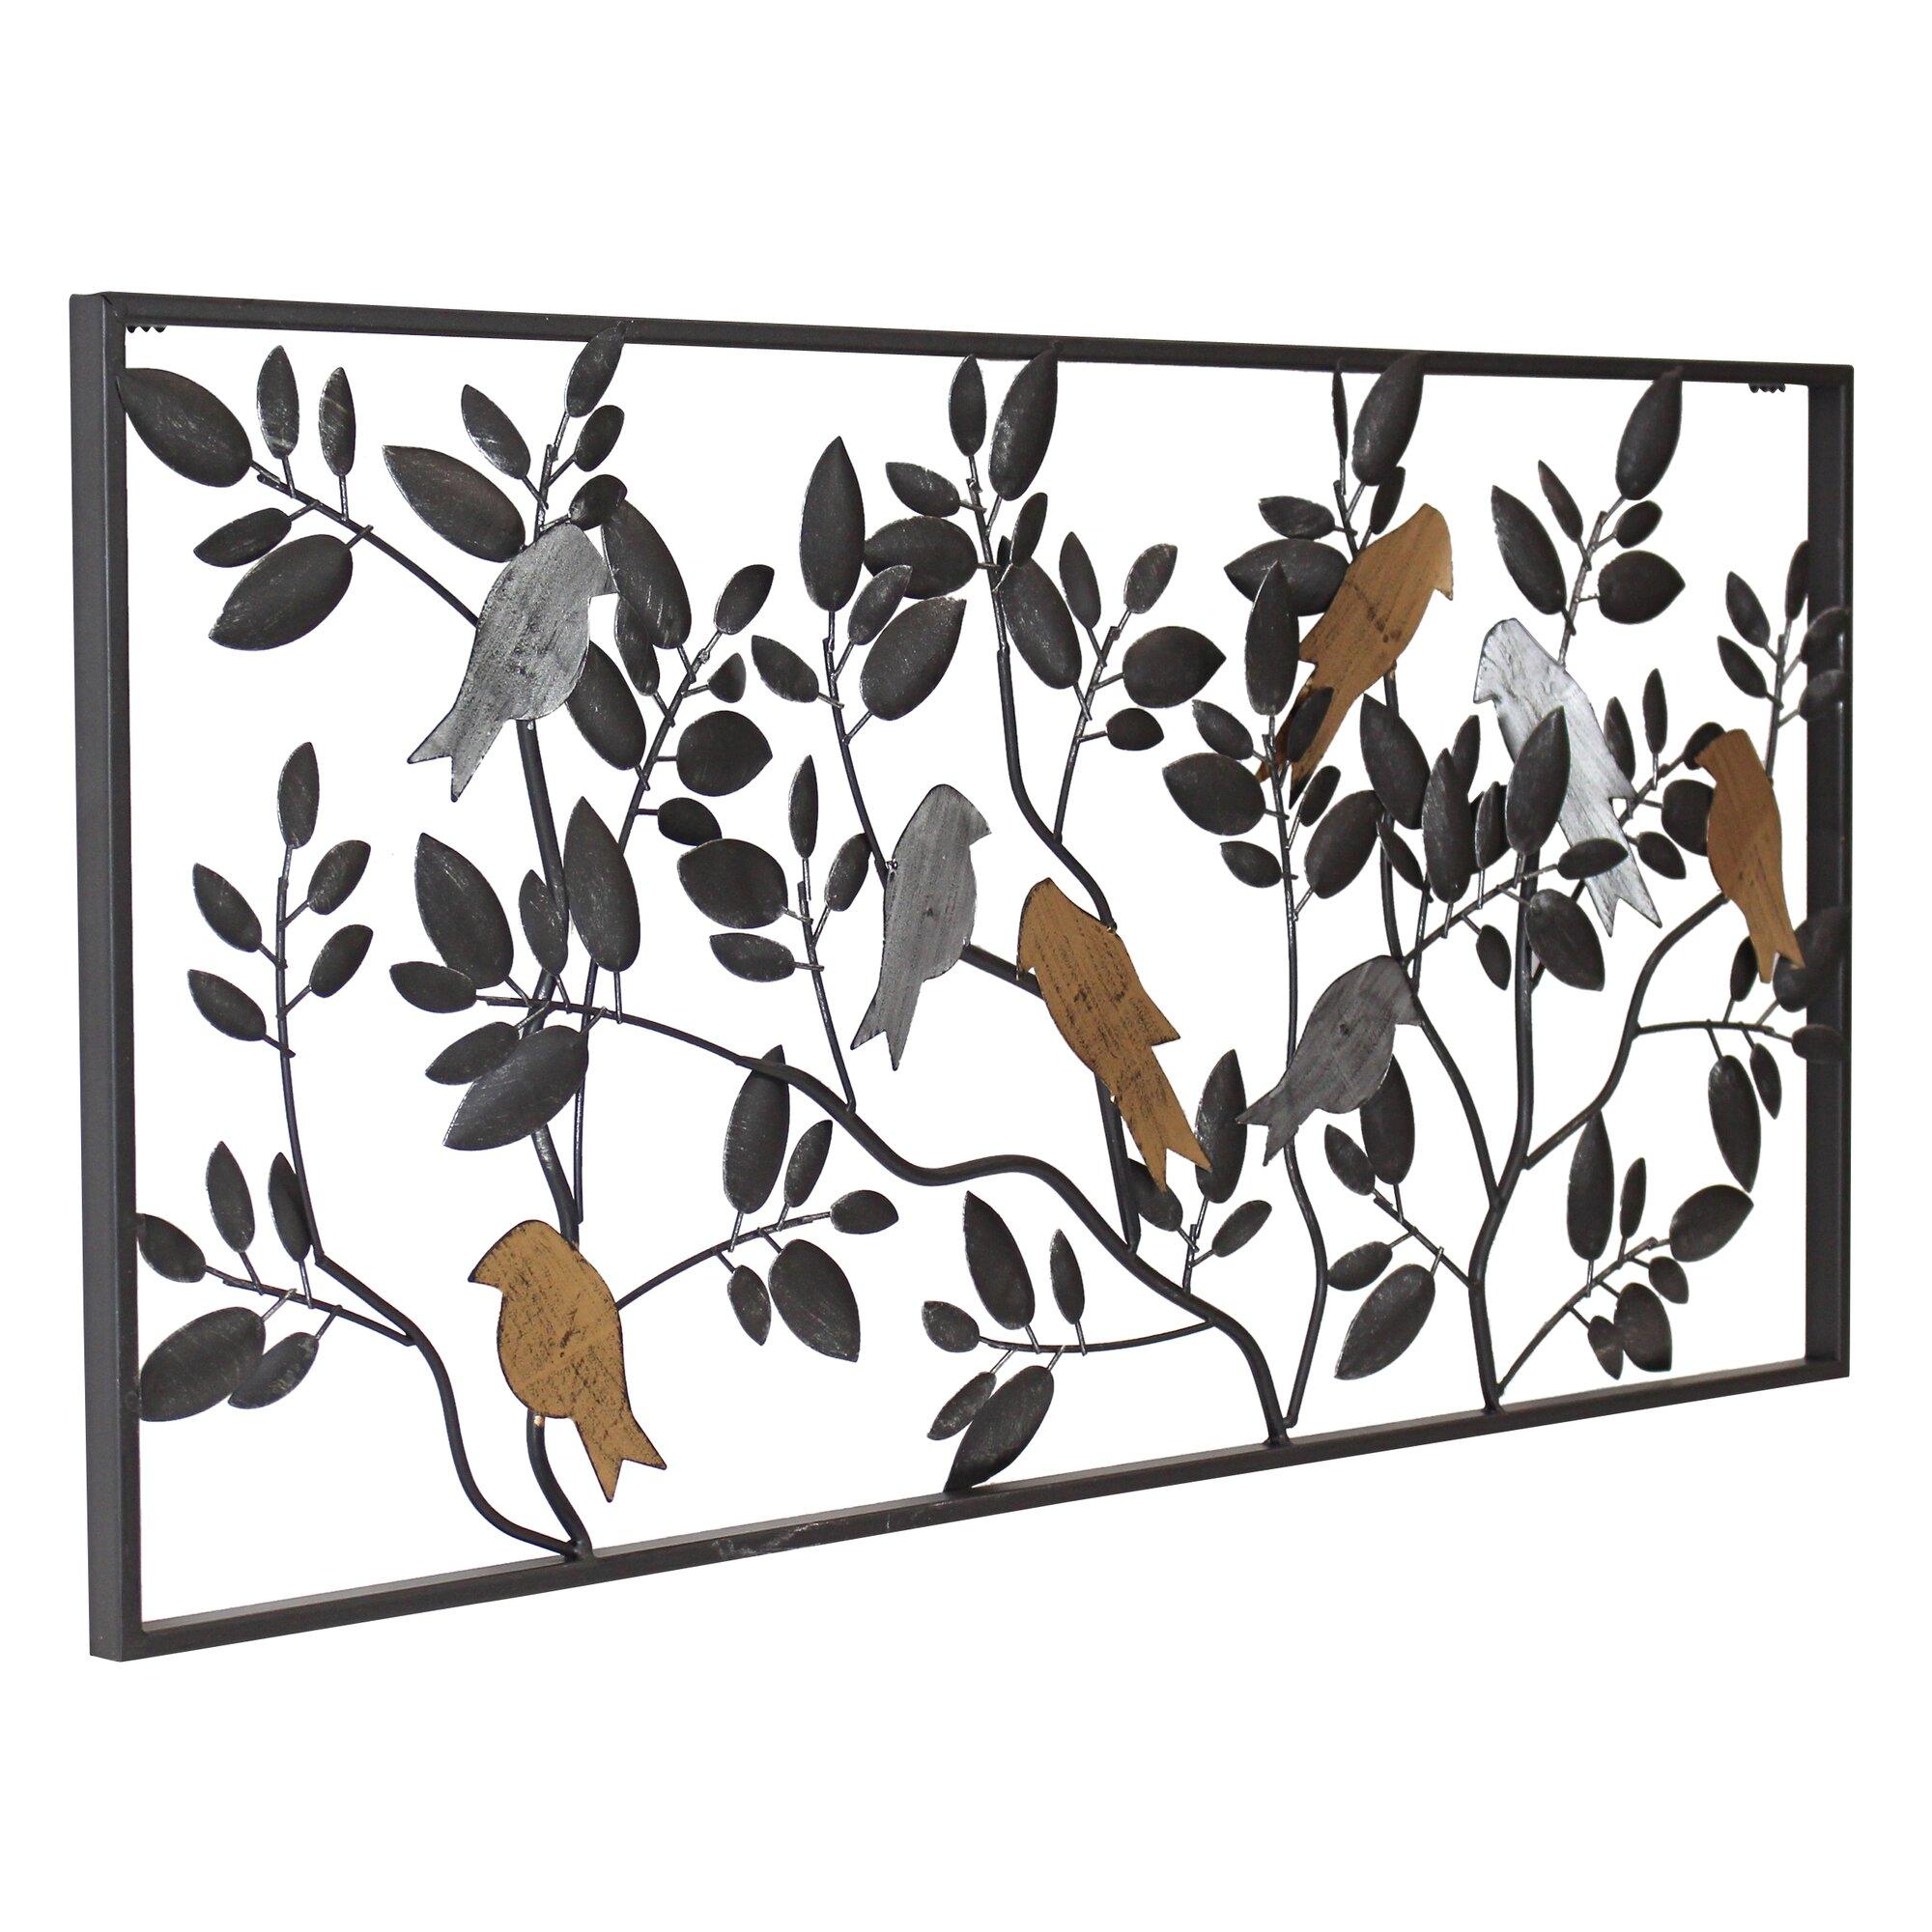 harmony bird wall dcor - Bird Wall Decor